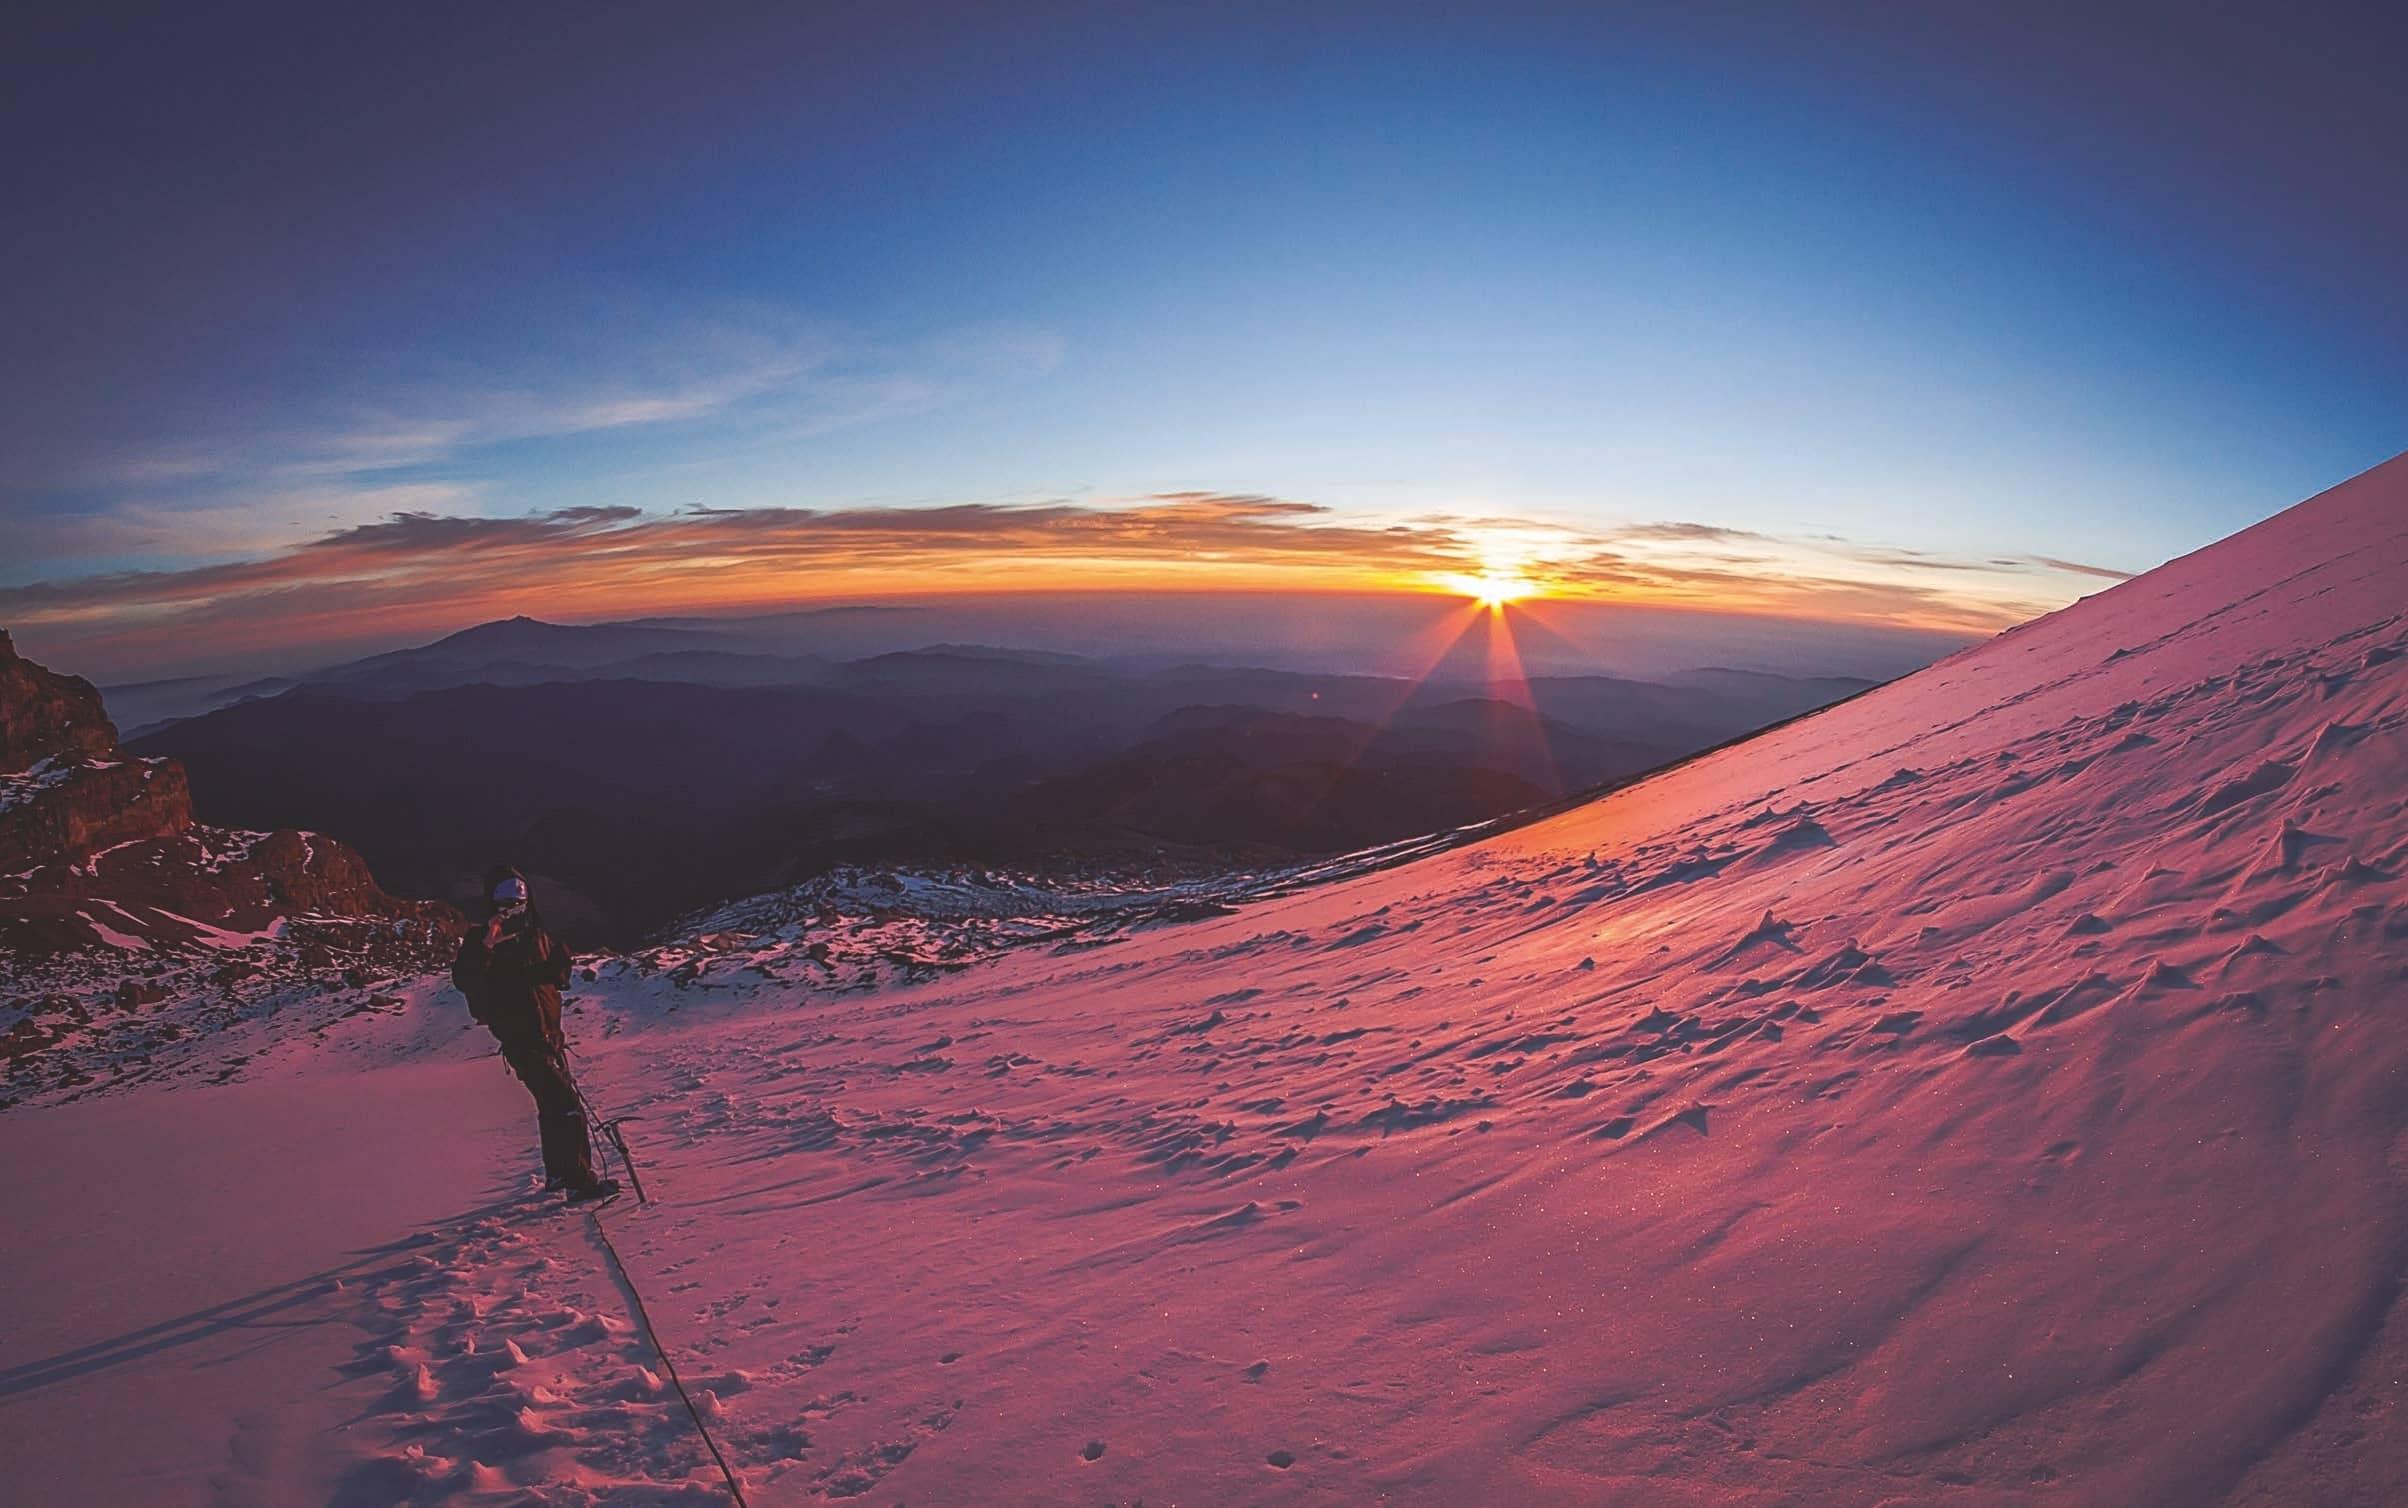 Citlaltépetl – Fotografiando la montaña más alta de México